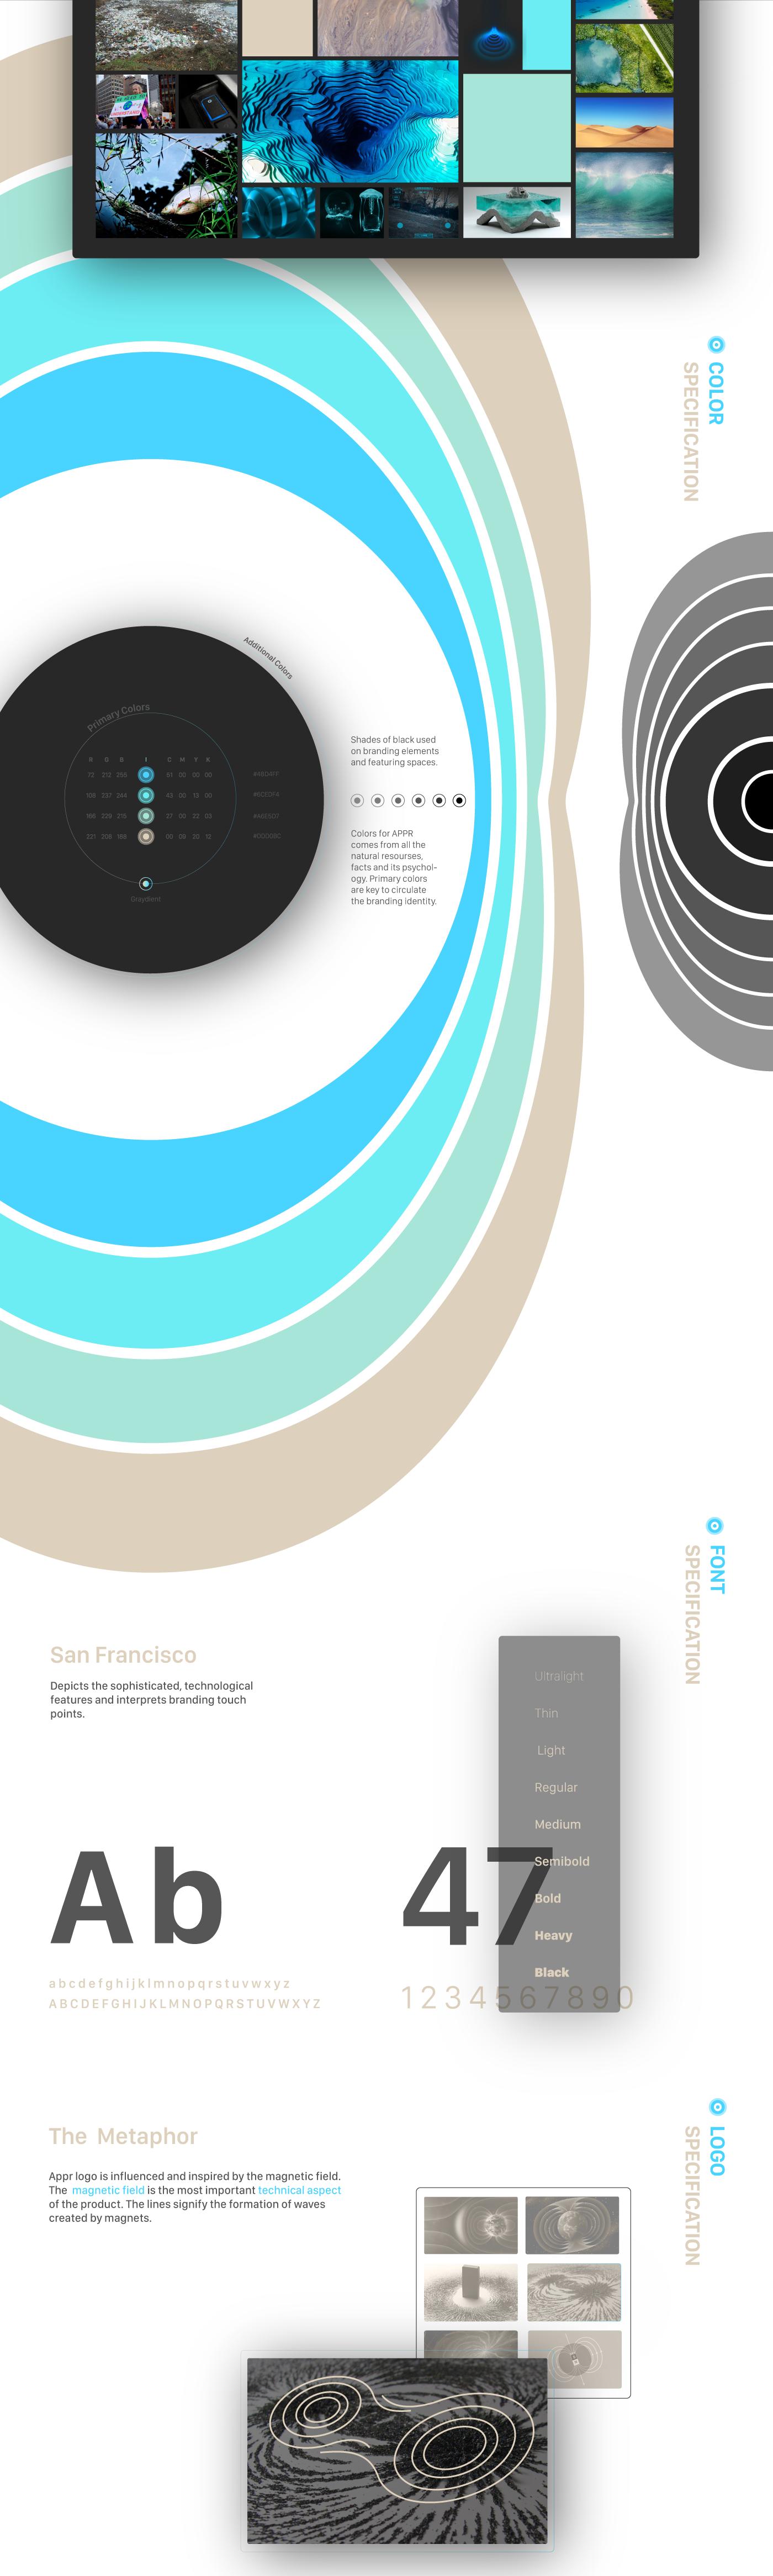 Technology future branding  visual identity art direction  Creative Direction  Logo Design Media planing plastic pollution digital design